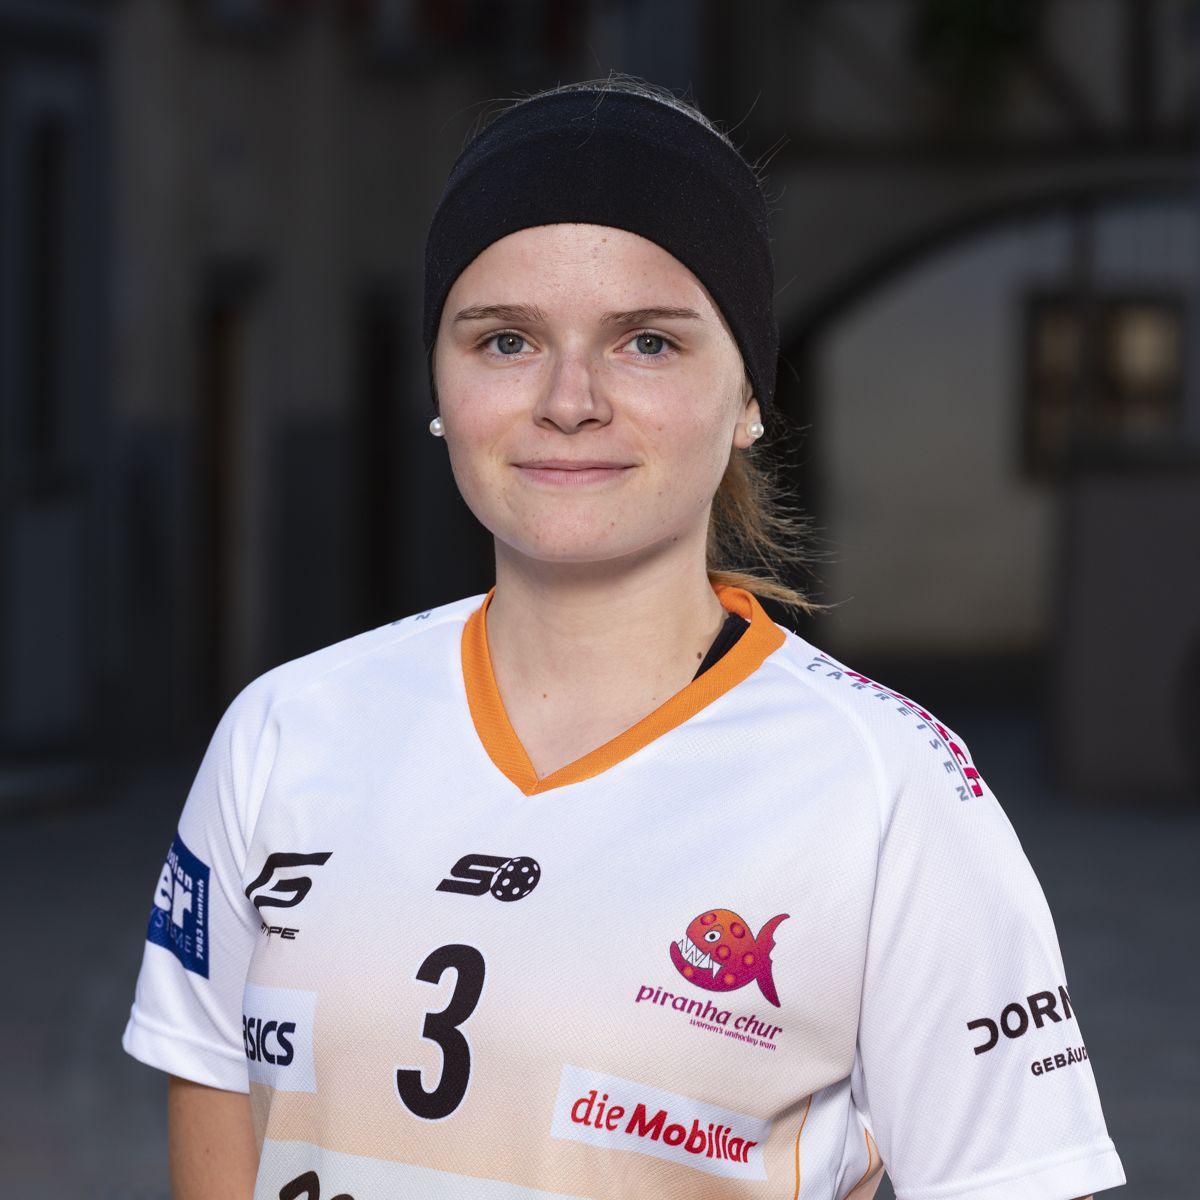 Luisa Cotti #3_NLA_piranha Chur_Saison 2019-2020_1200x1200_01.jpg